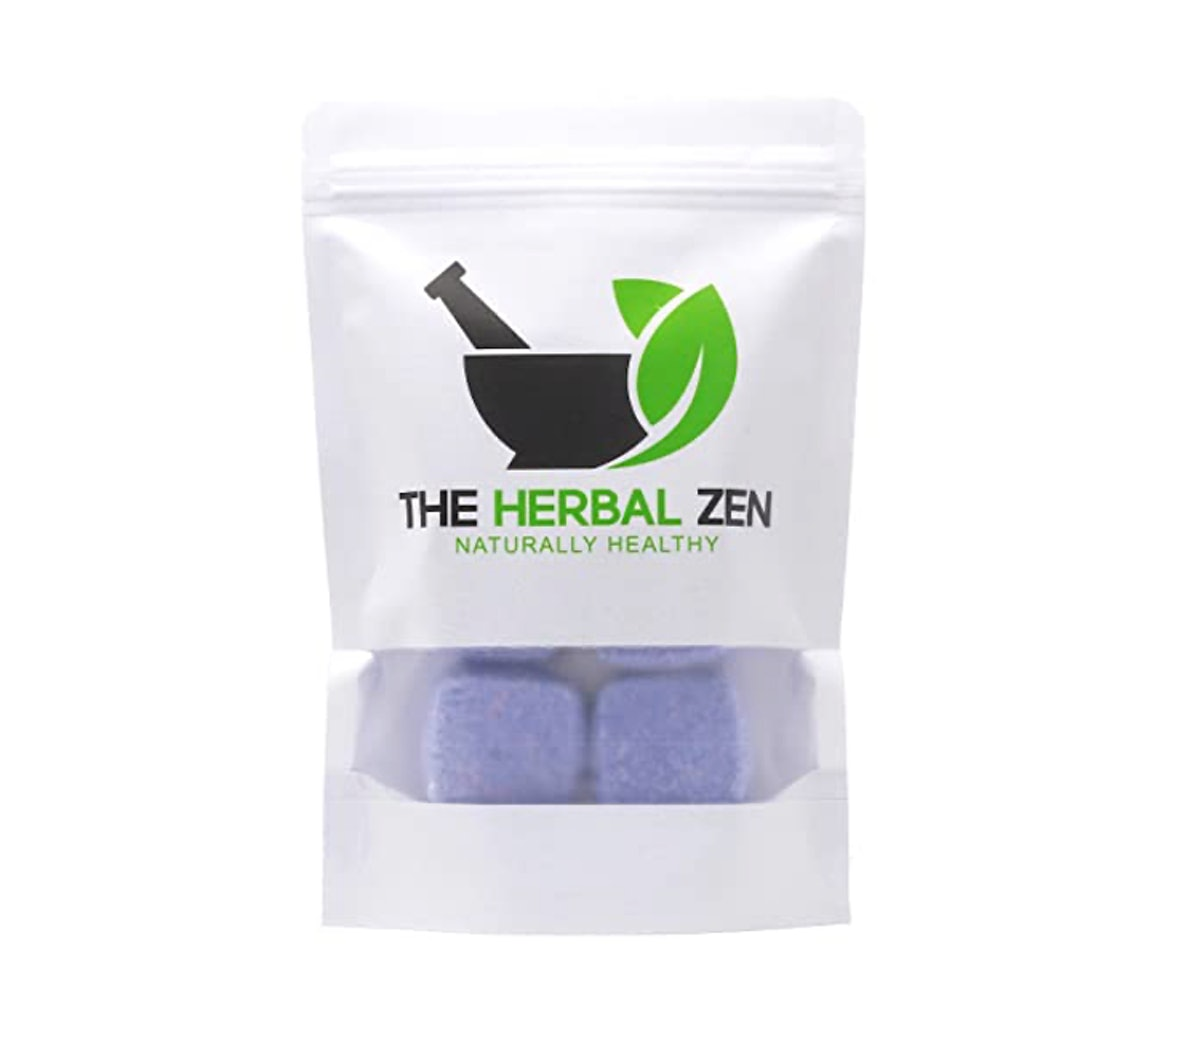 The Herbal Zen Sleepytime Shower Steamers